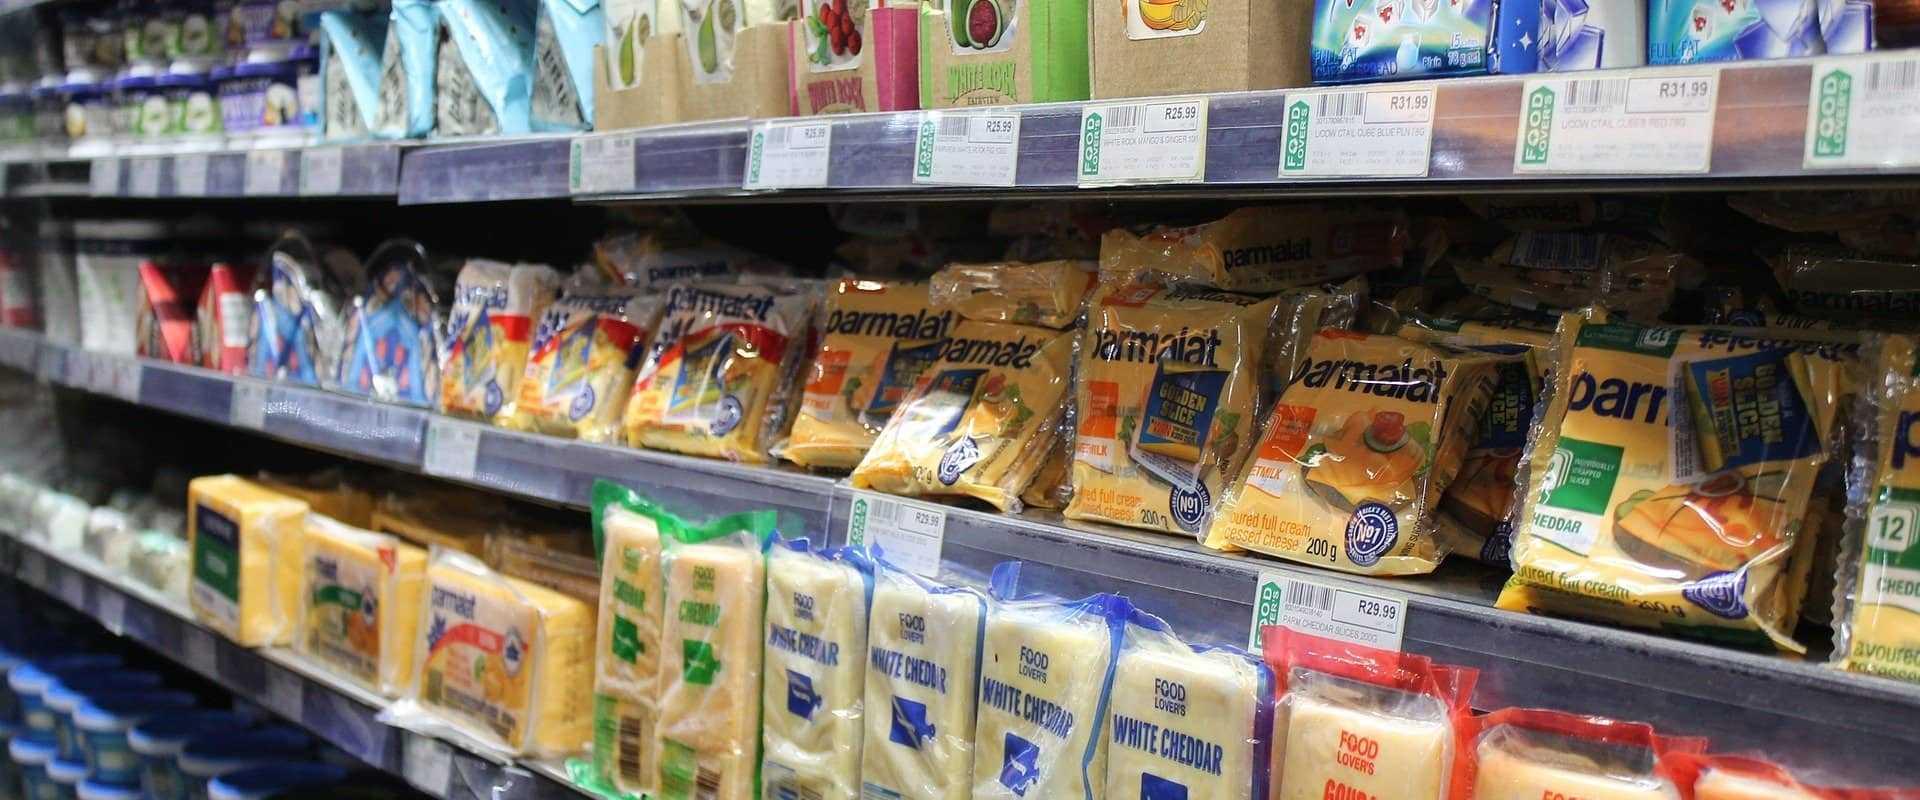 Lebensmittel für Kühlregale lagern